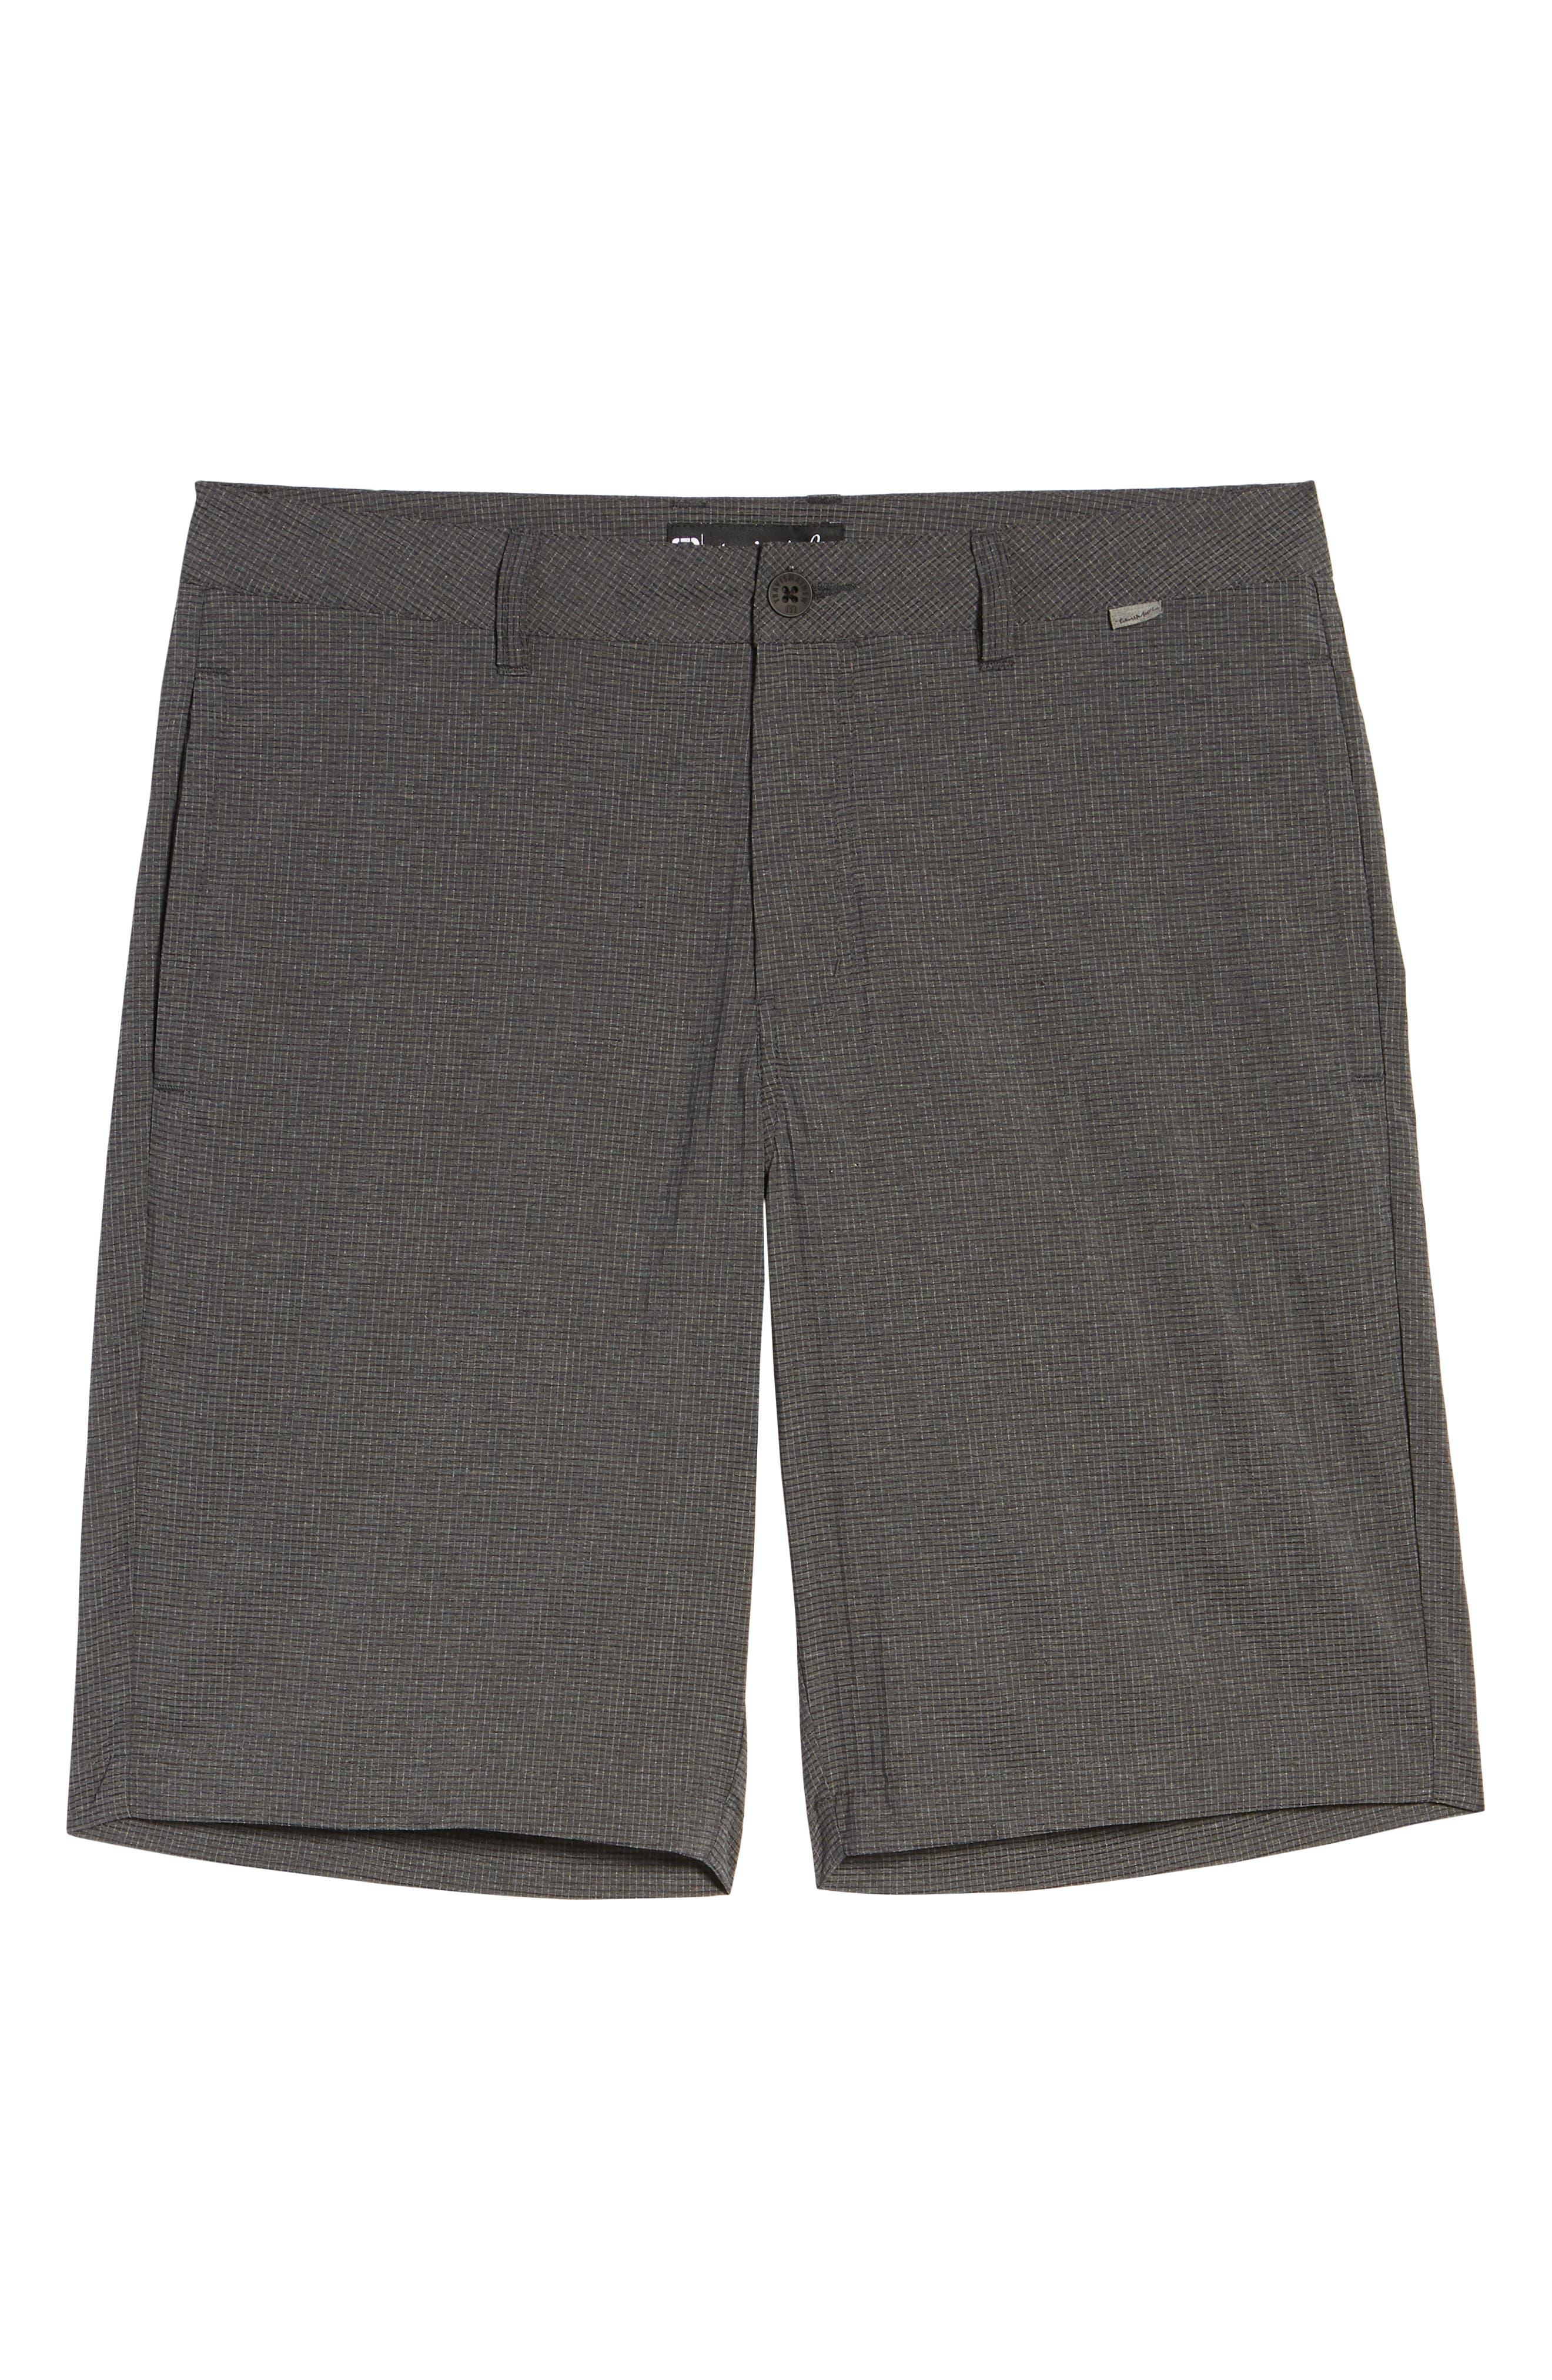 Peel Out Shorts,                             Alternate thumbnail 6, color,                             GREY PINSTRIPE